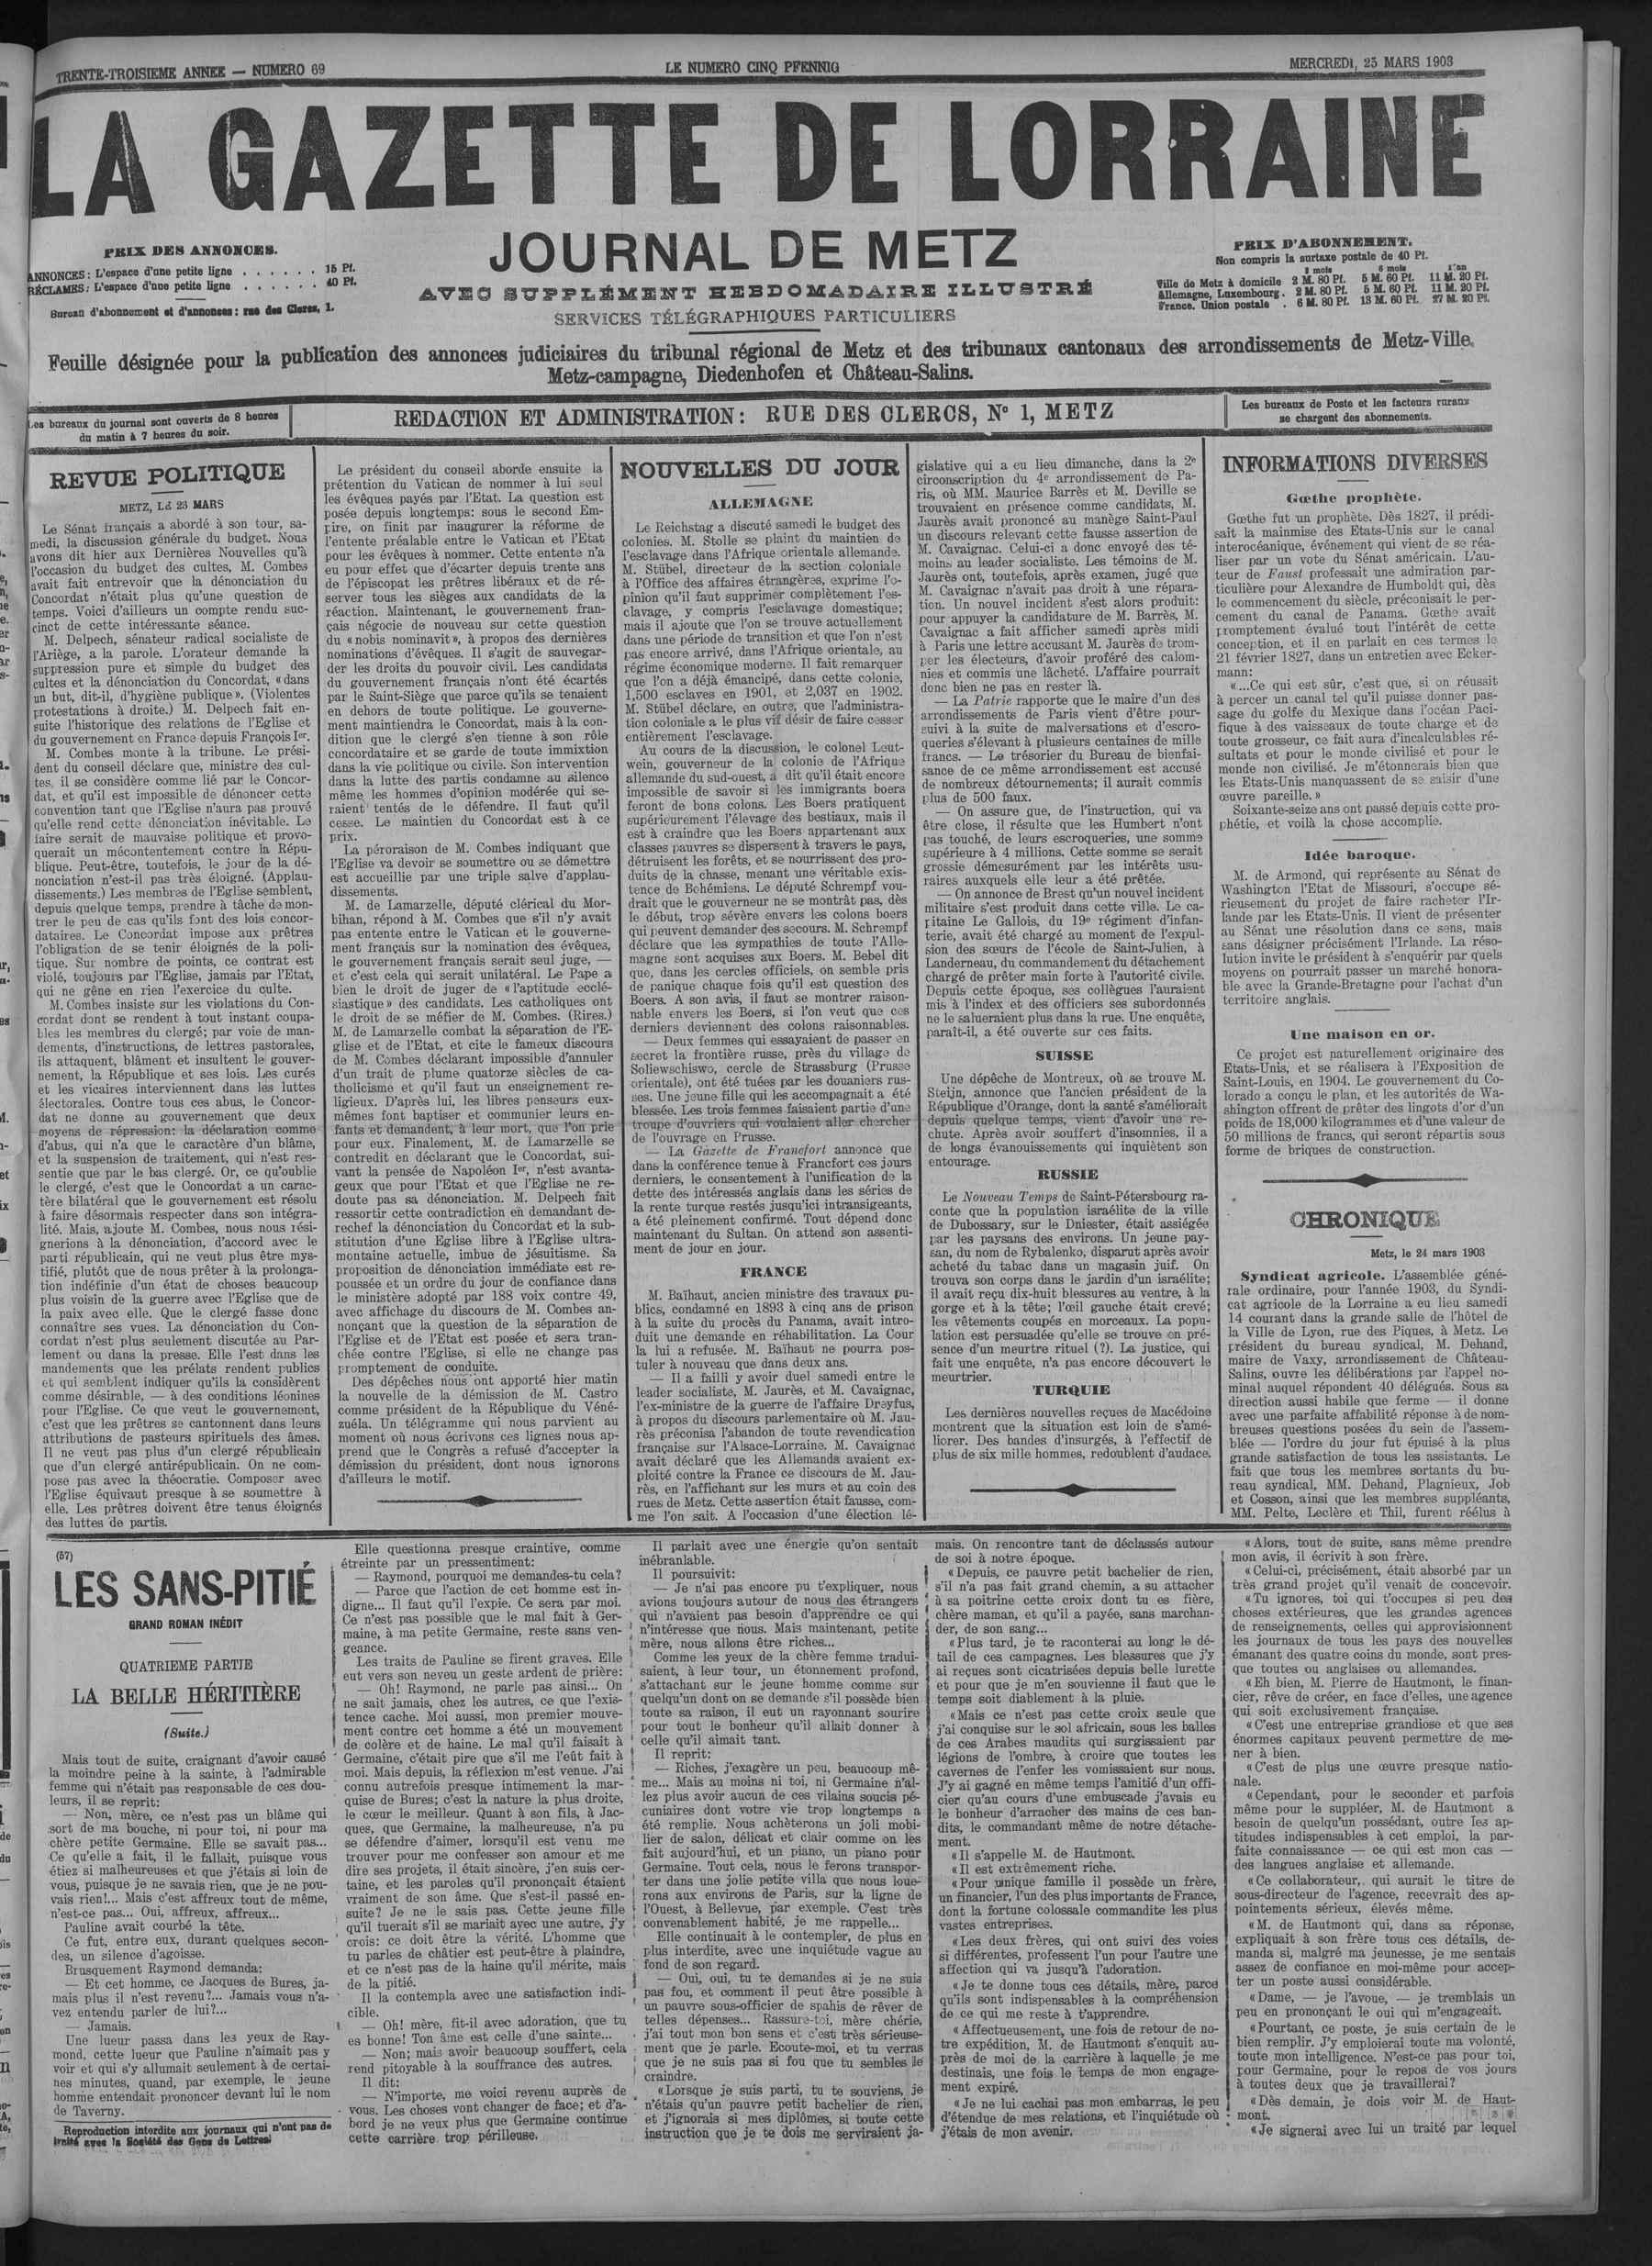 Contenu du La Gazette de Lorraine journal de Metz